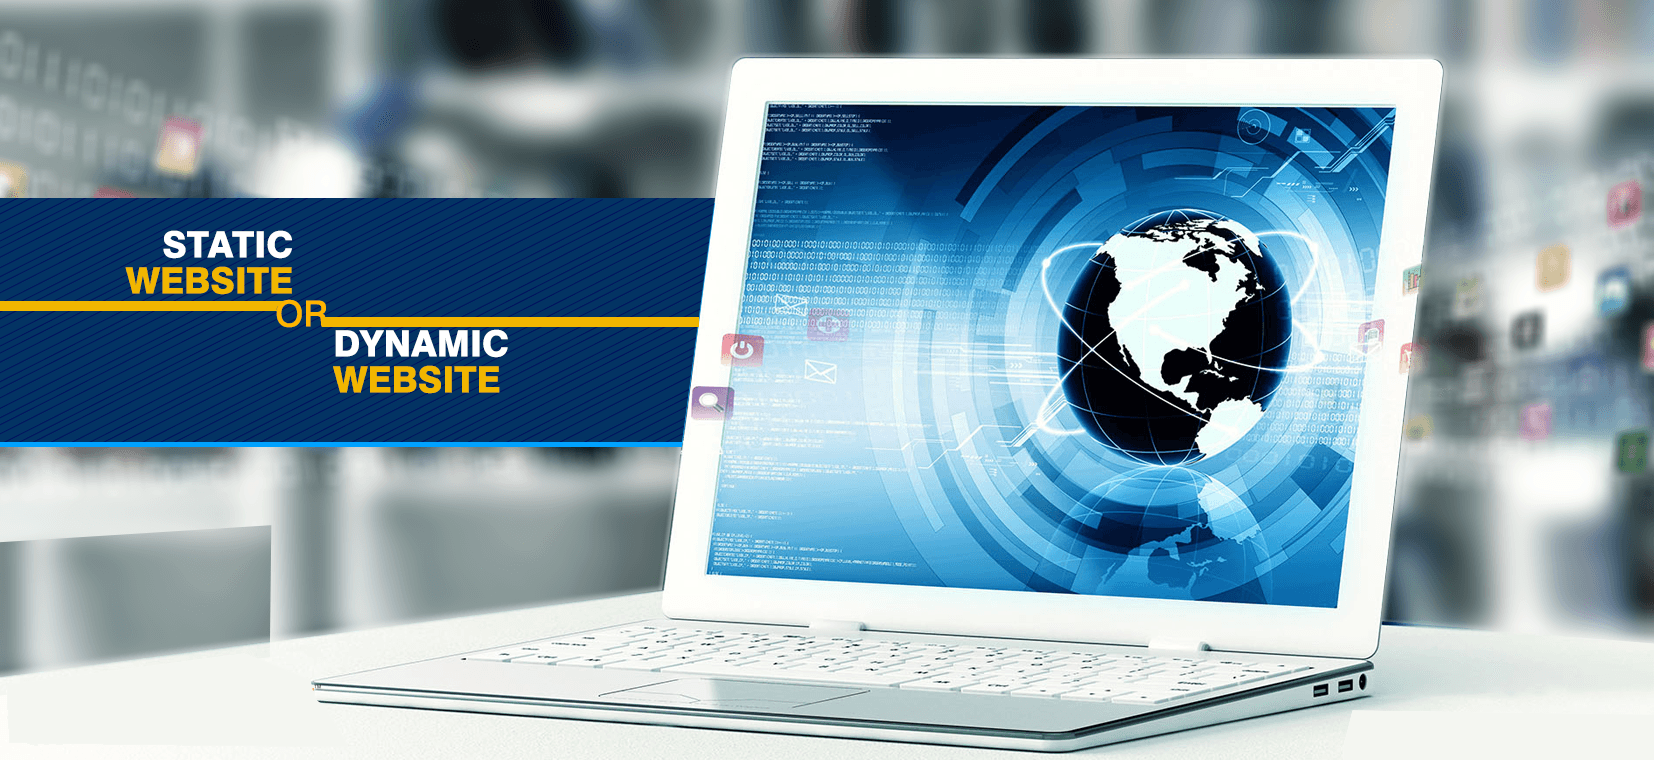 Top 9 Differentiating Factors Between Static vs Dynamic Website